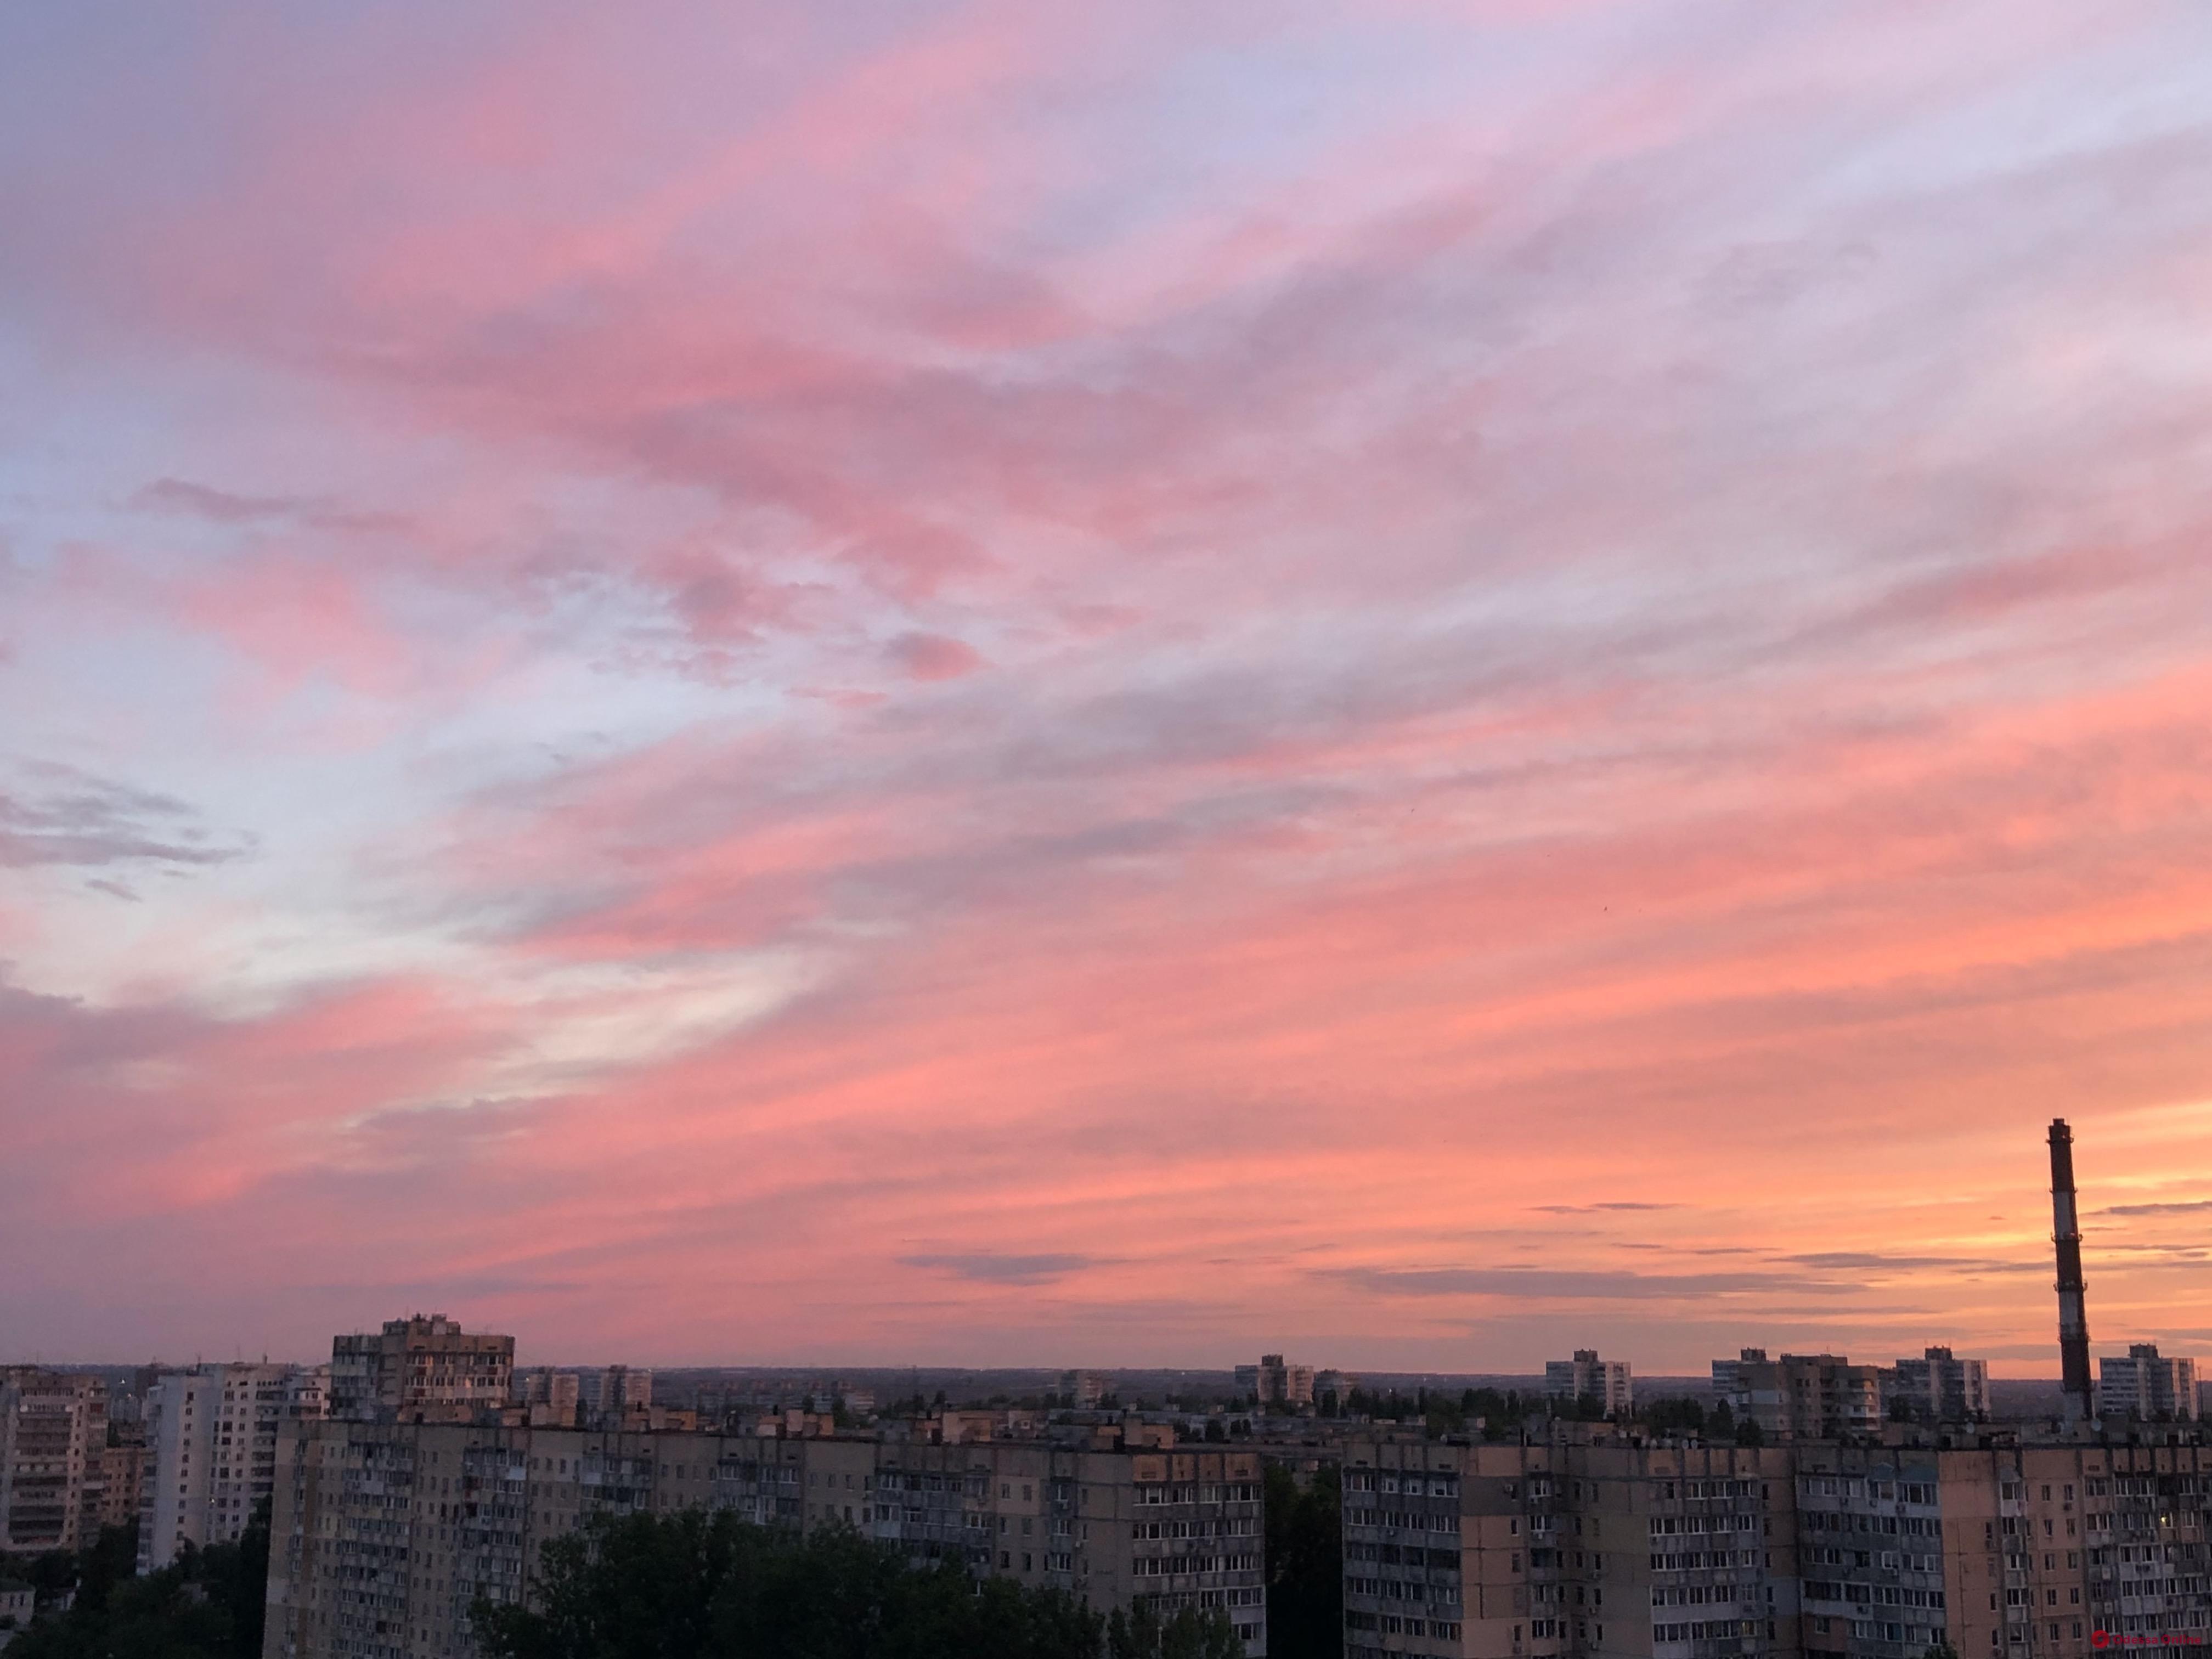 В Одессе наблюдали розовый закат (фотофакт)